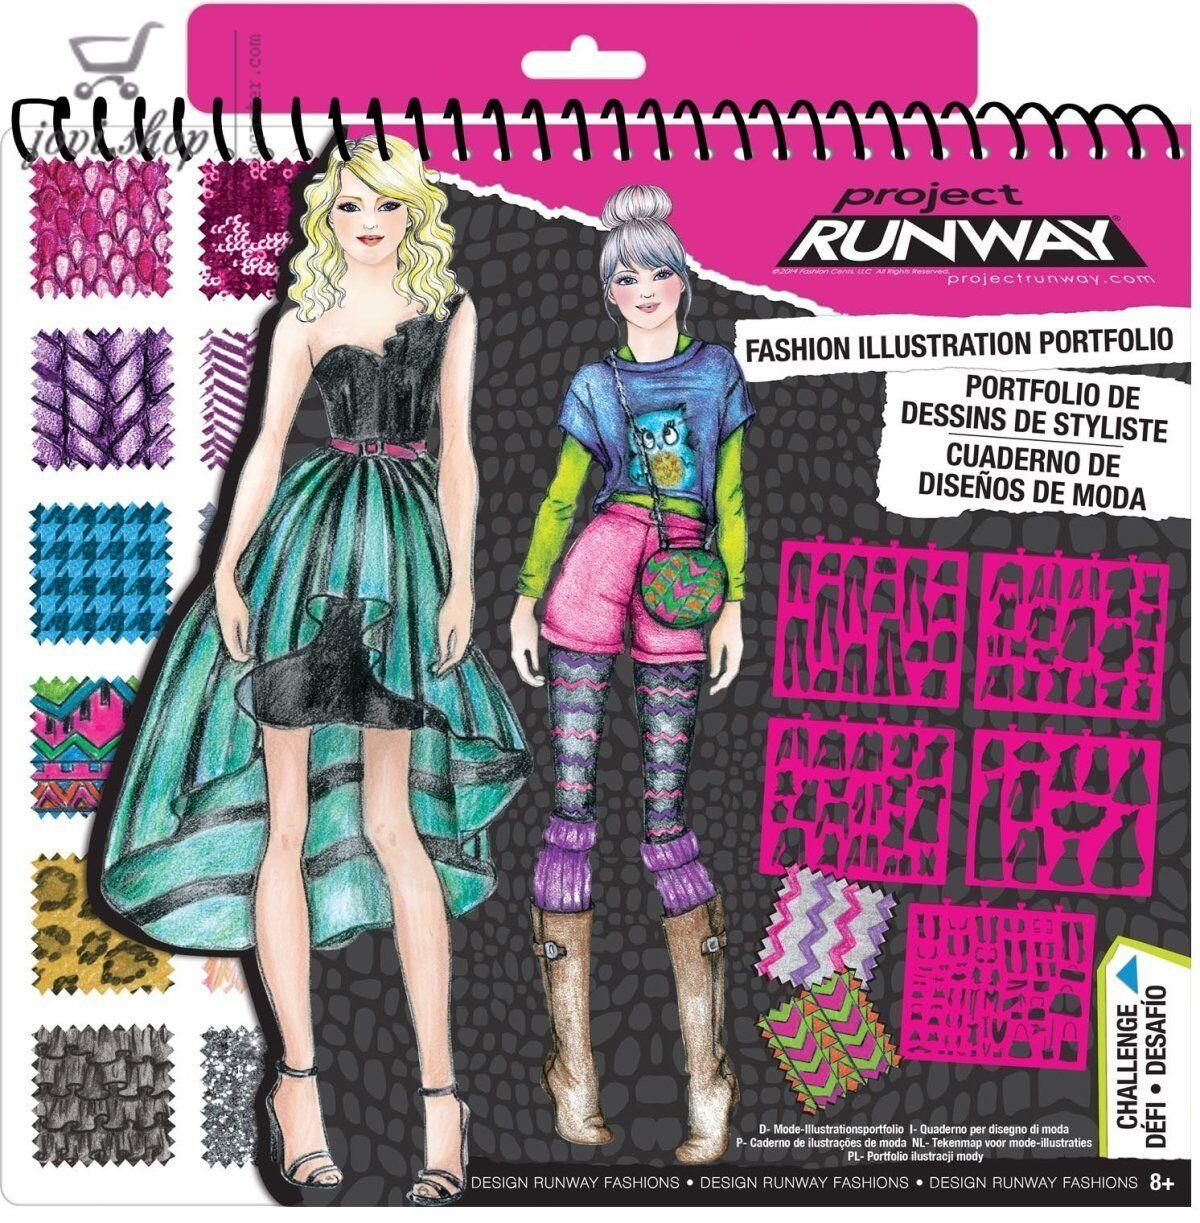 Project runway fashion design illustration studio set